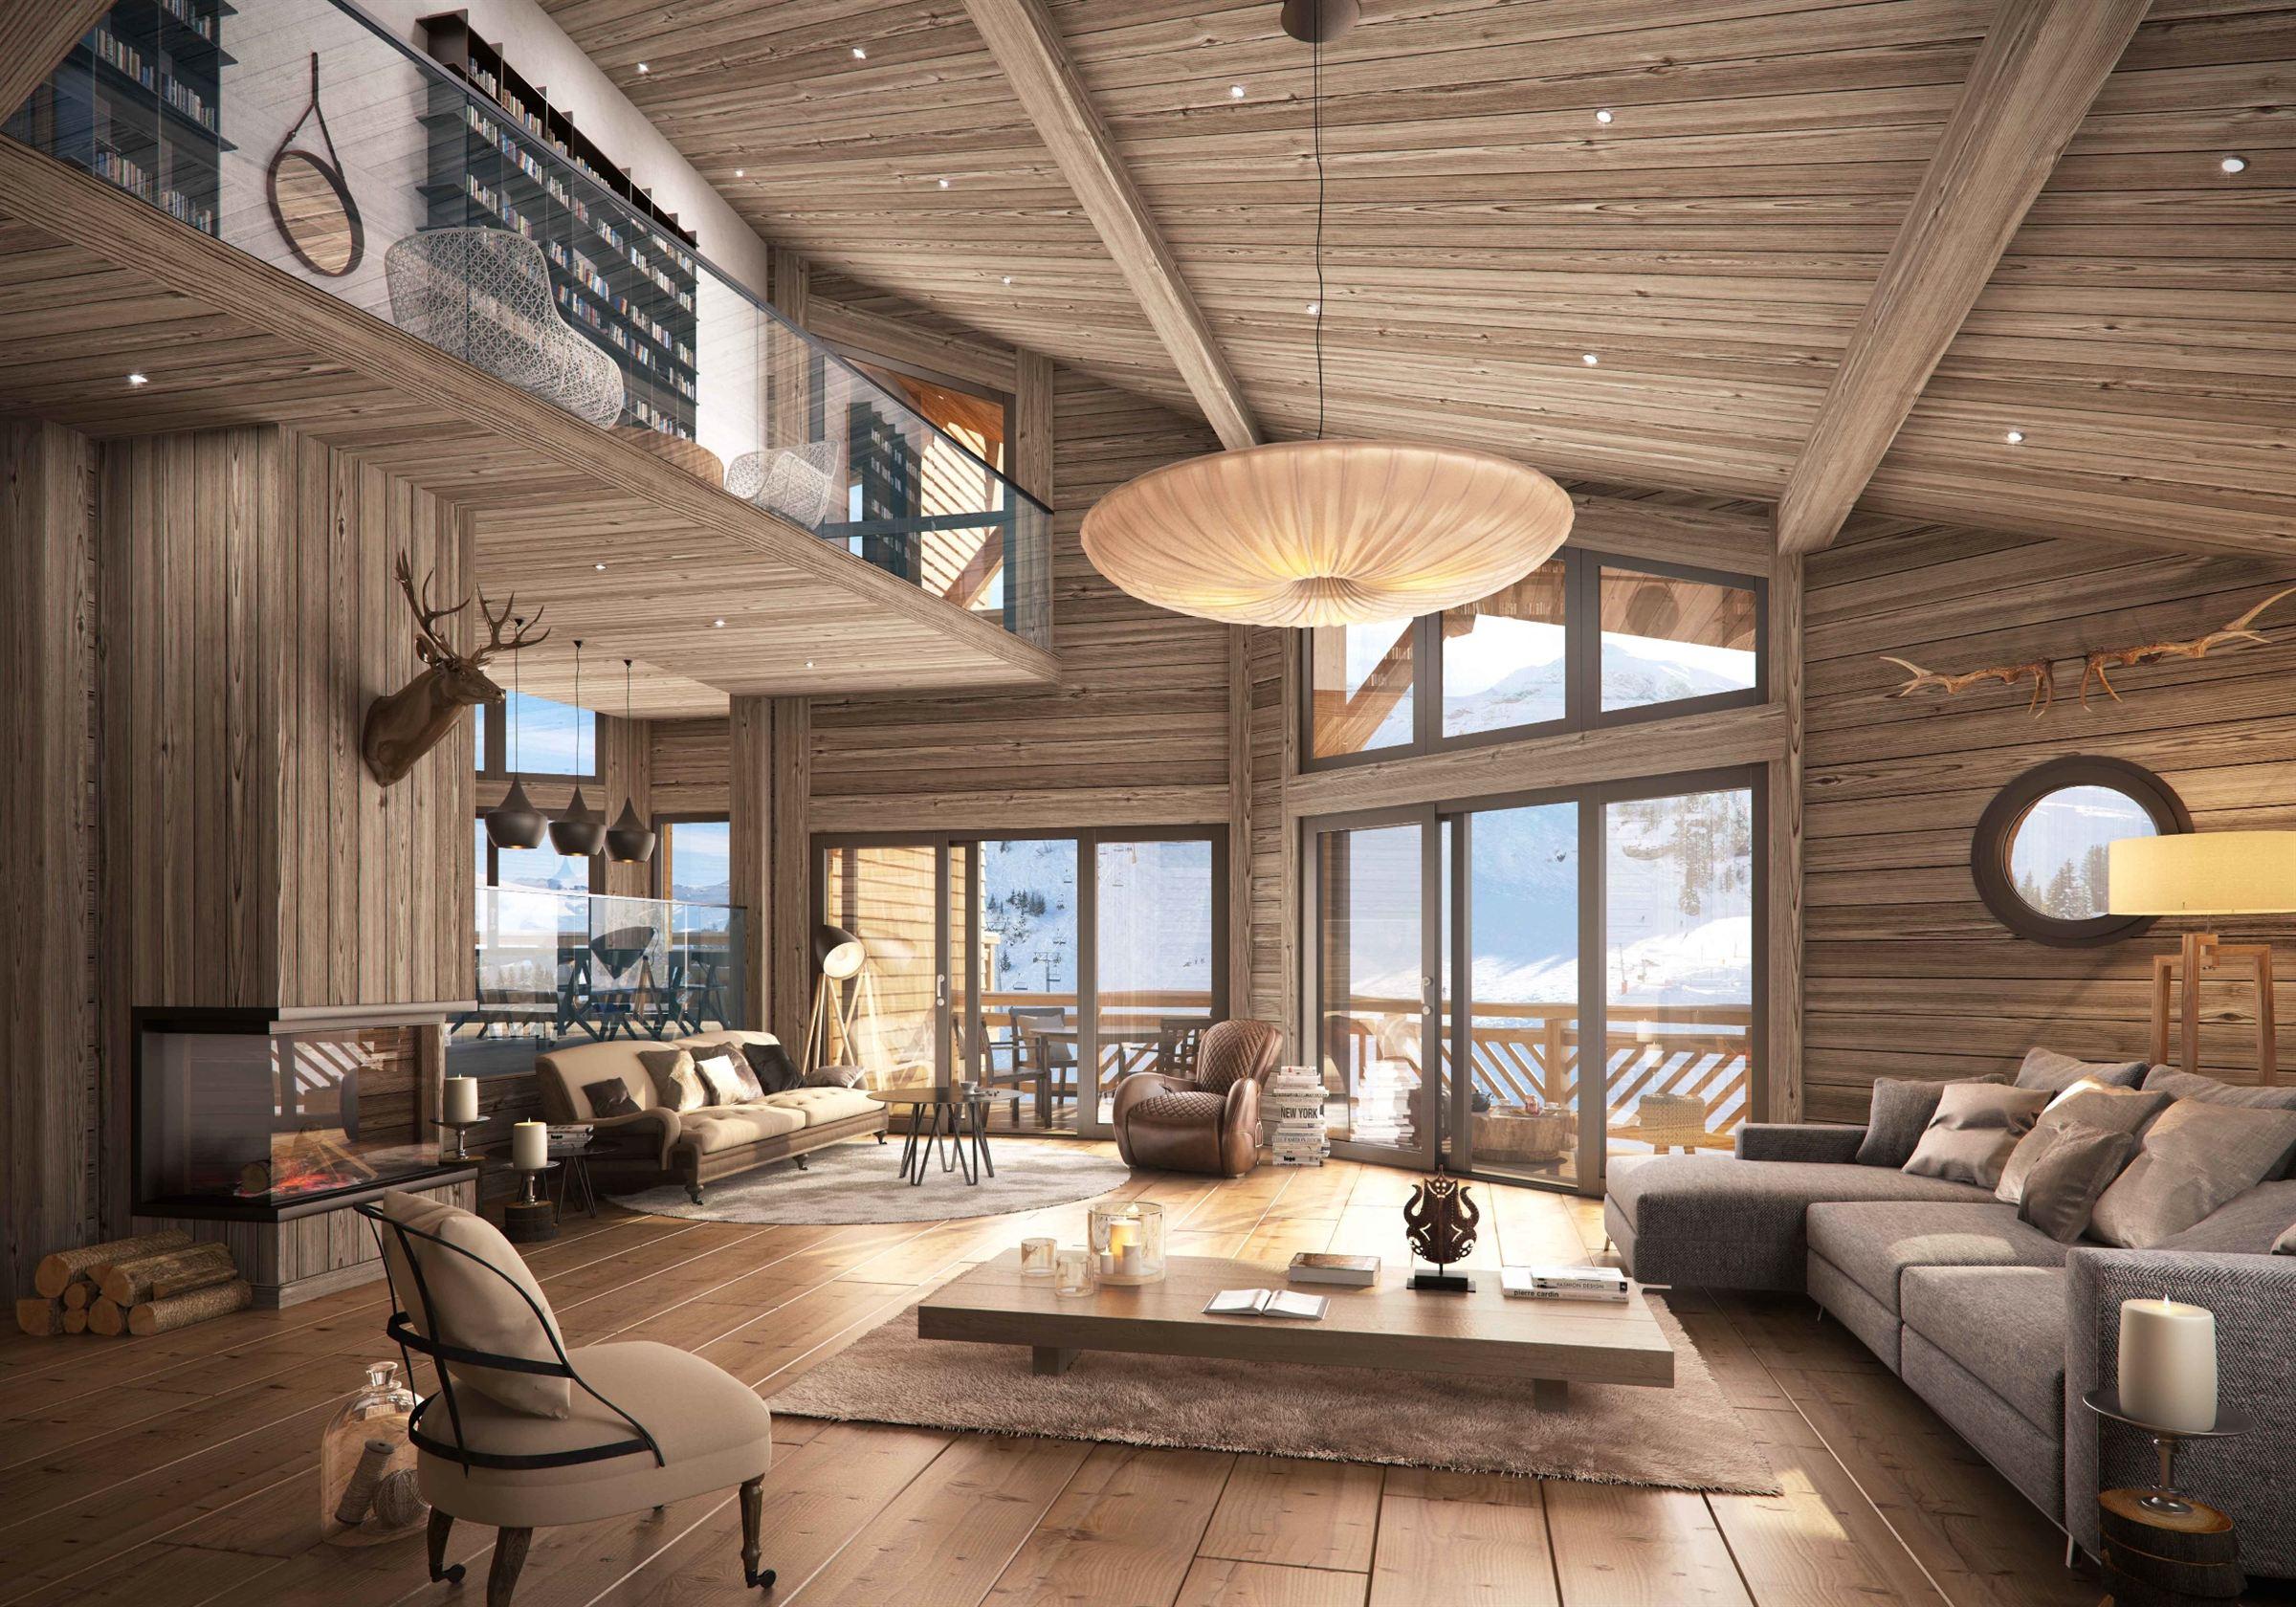 Single Family Home for Sale at Chalet Morzine, Rhone-Alpes, 74110 France